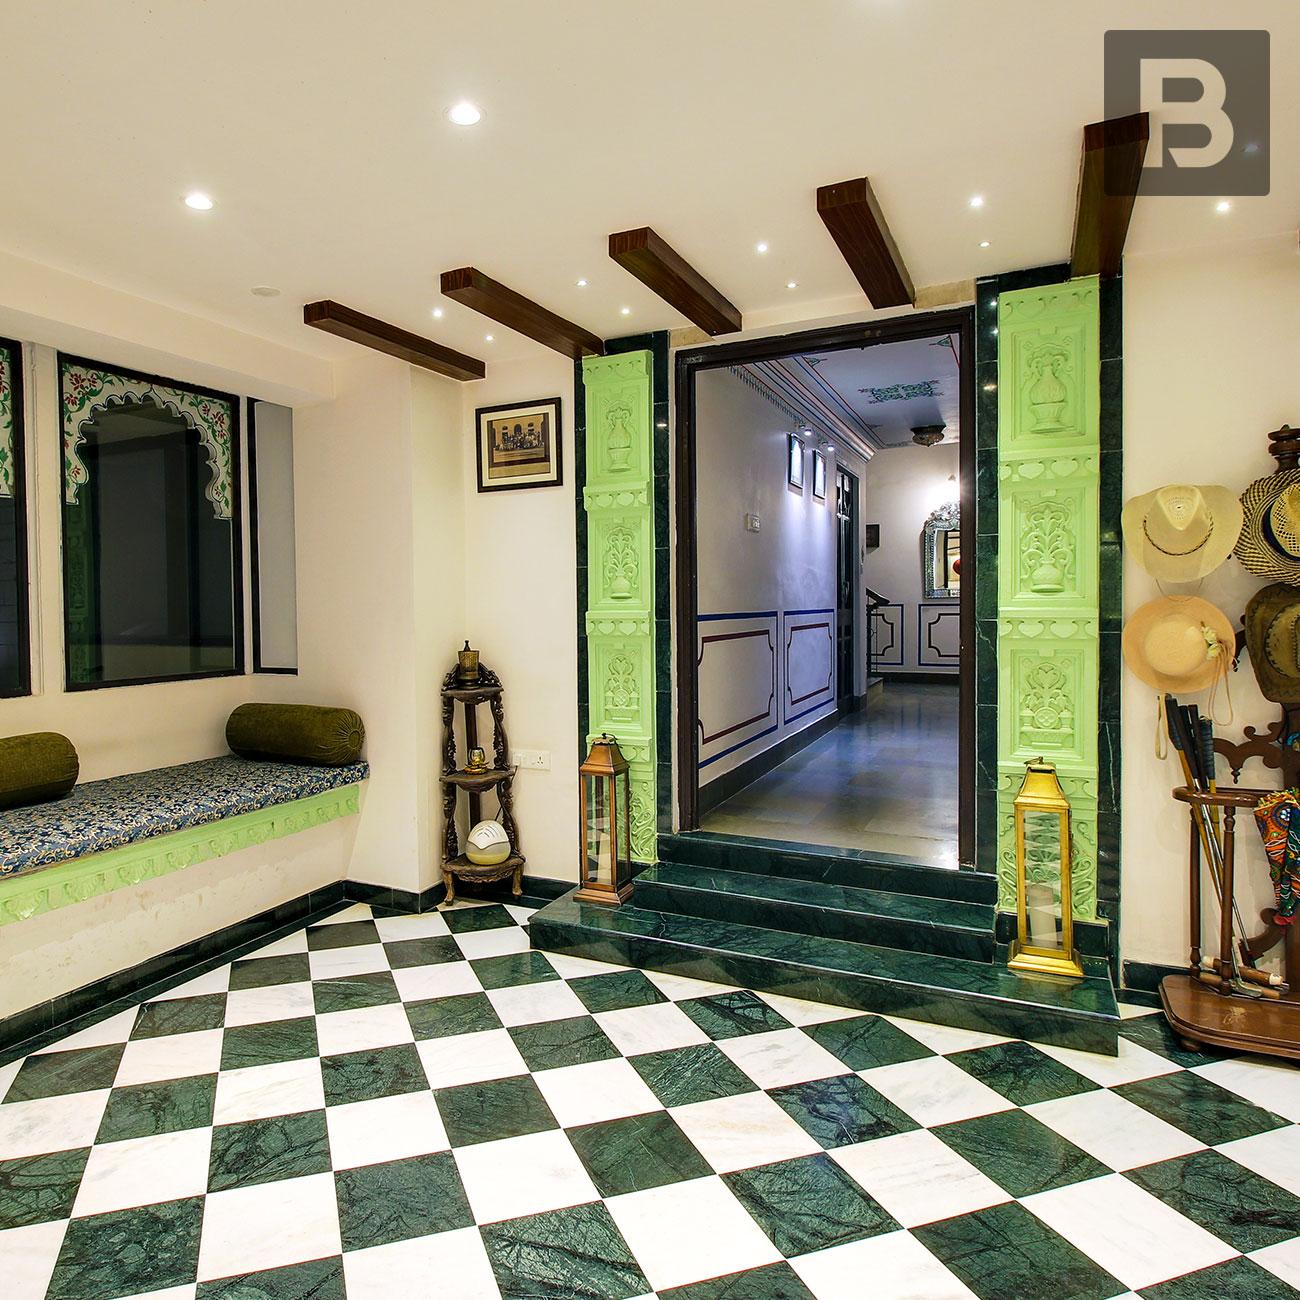 Beyond Stay Panna Villas, Udaipur